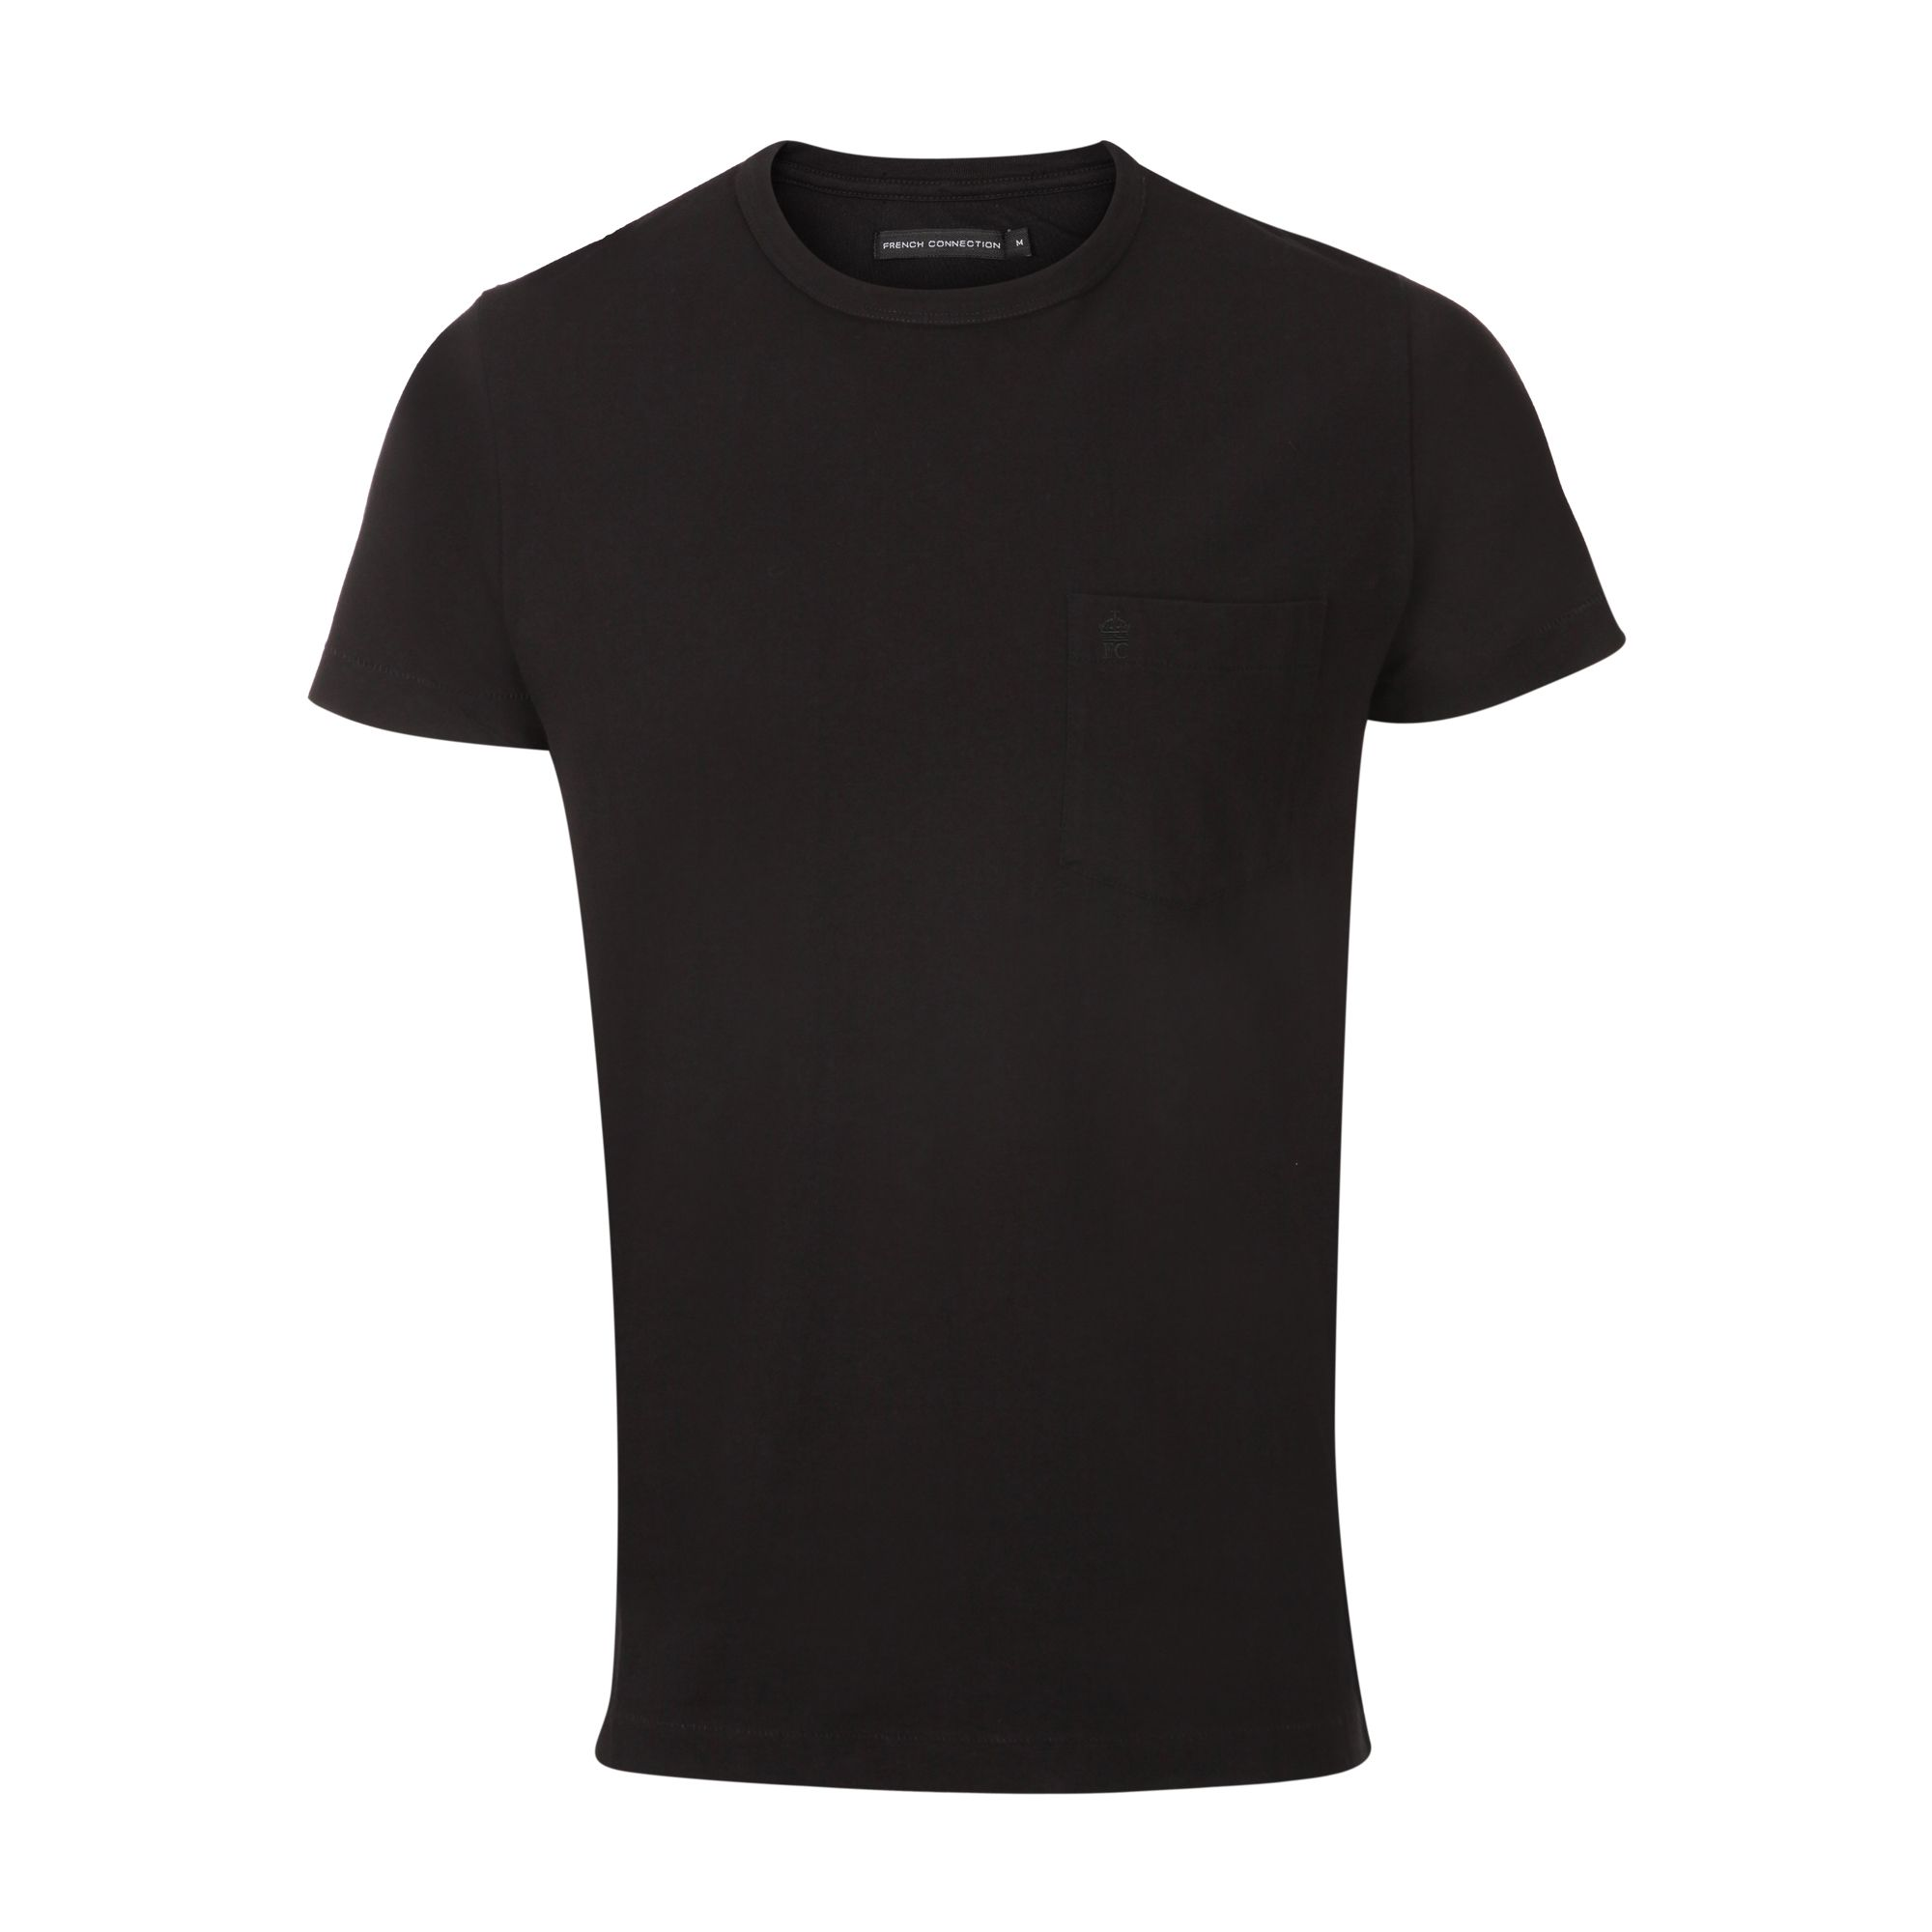 Plain black t shirt clip art male models picture for Plain t shirt model